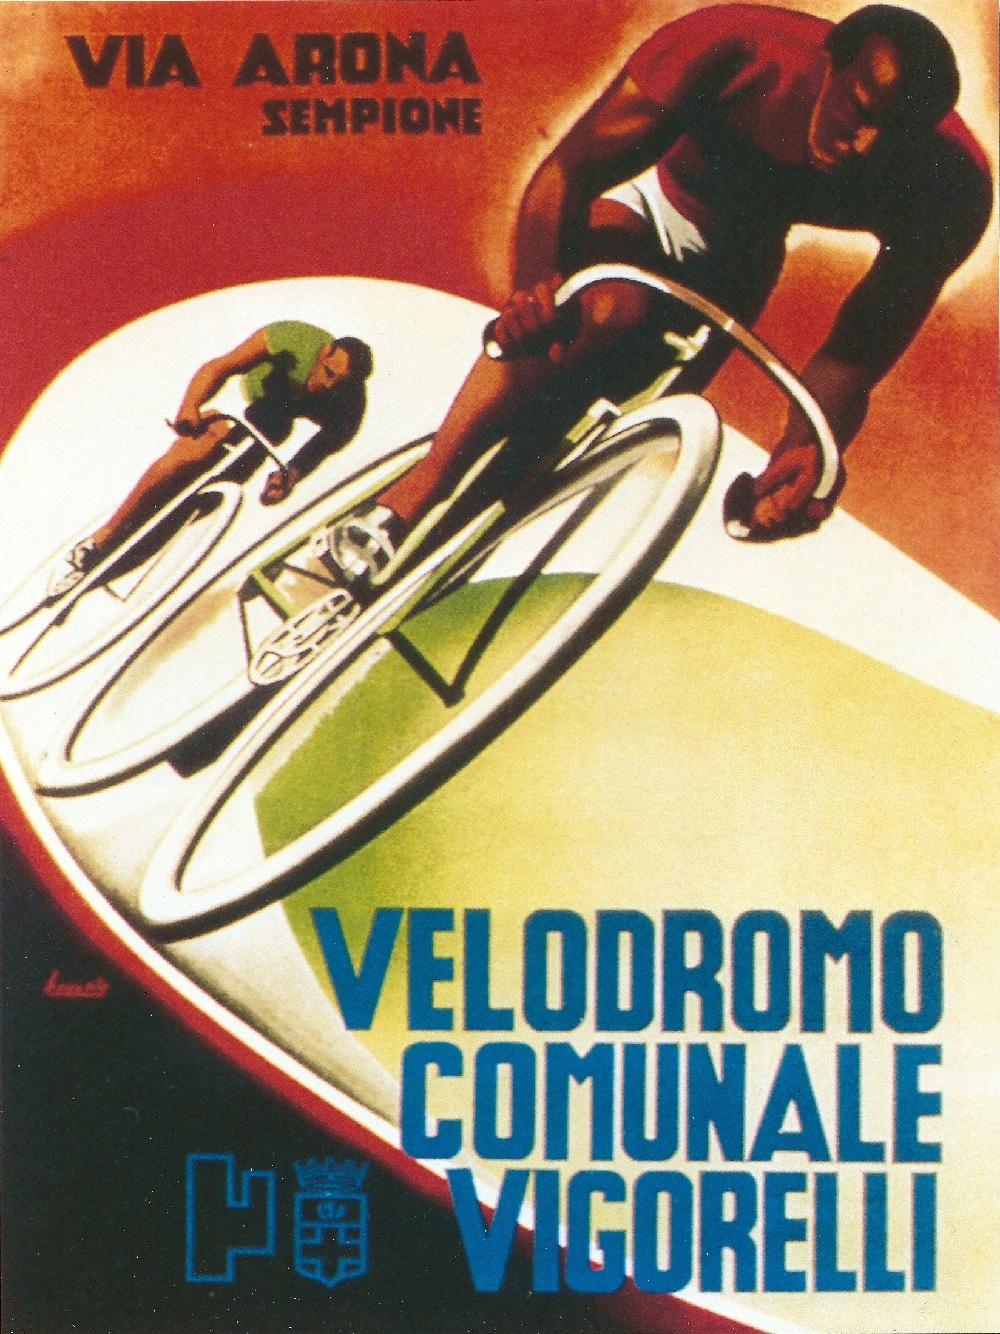 Velodromo Vigorelli Poster